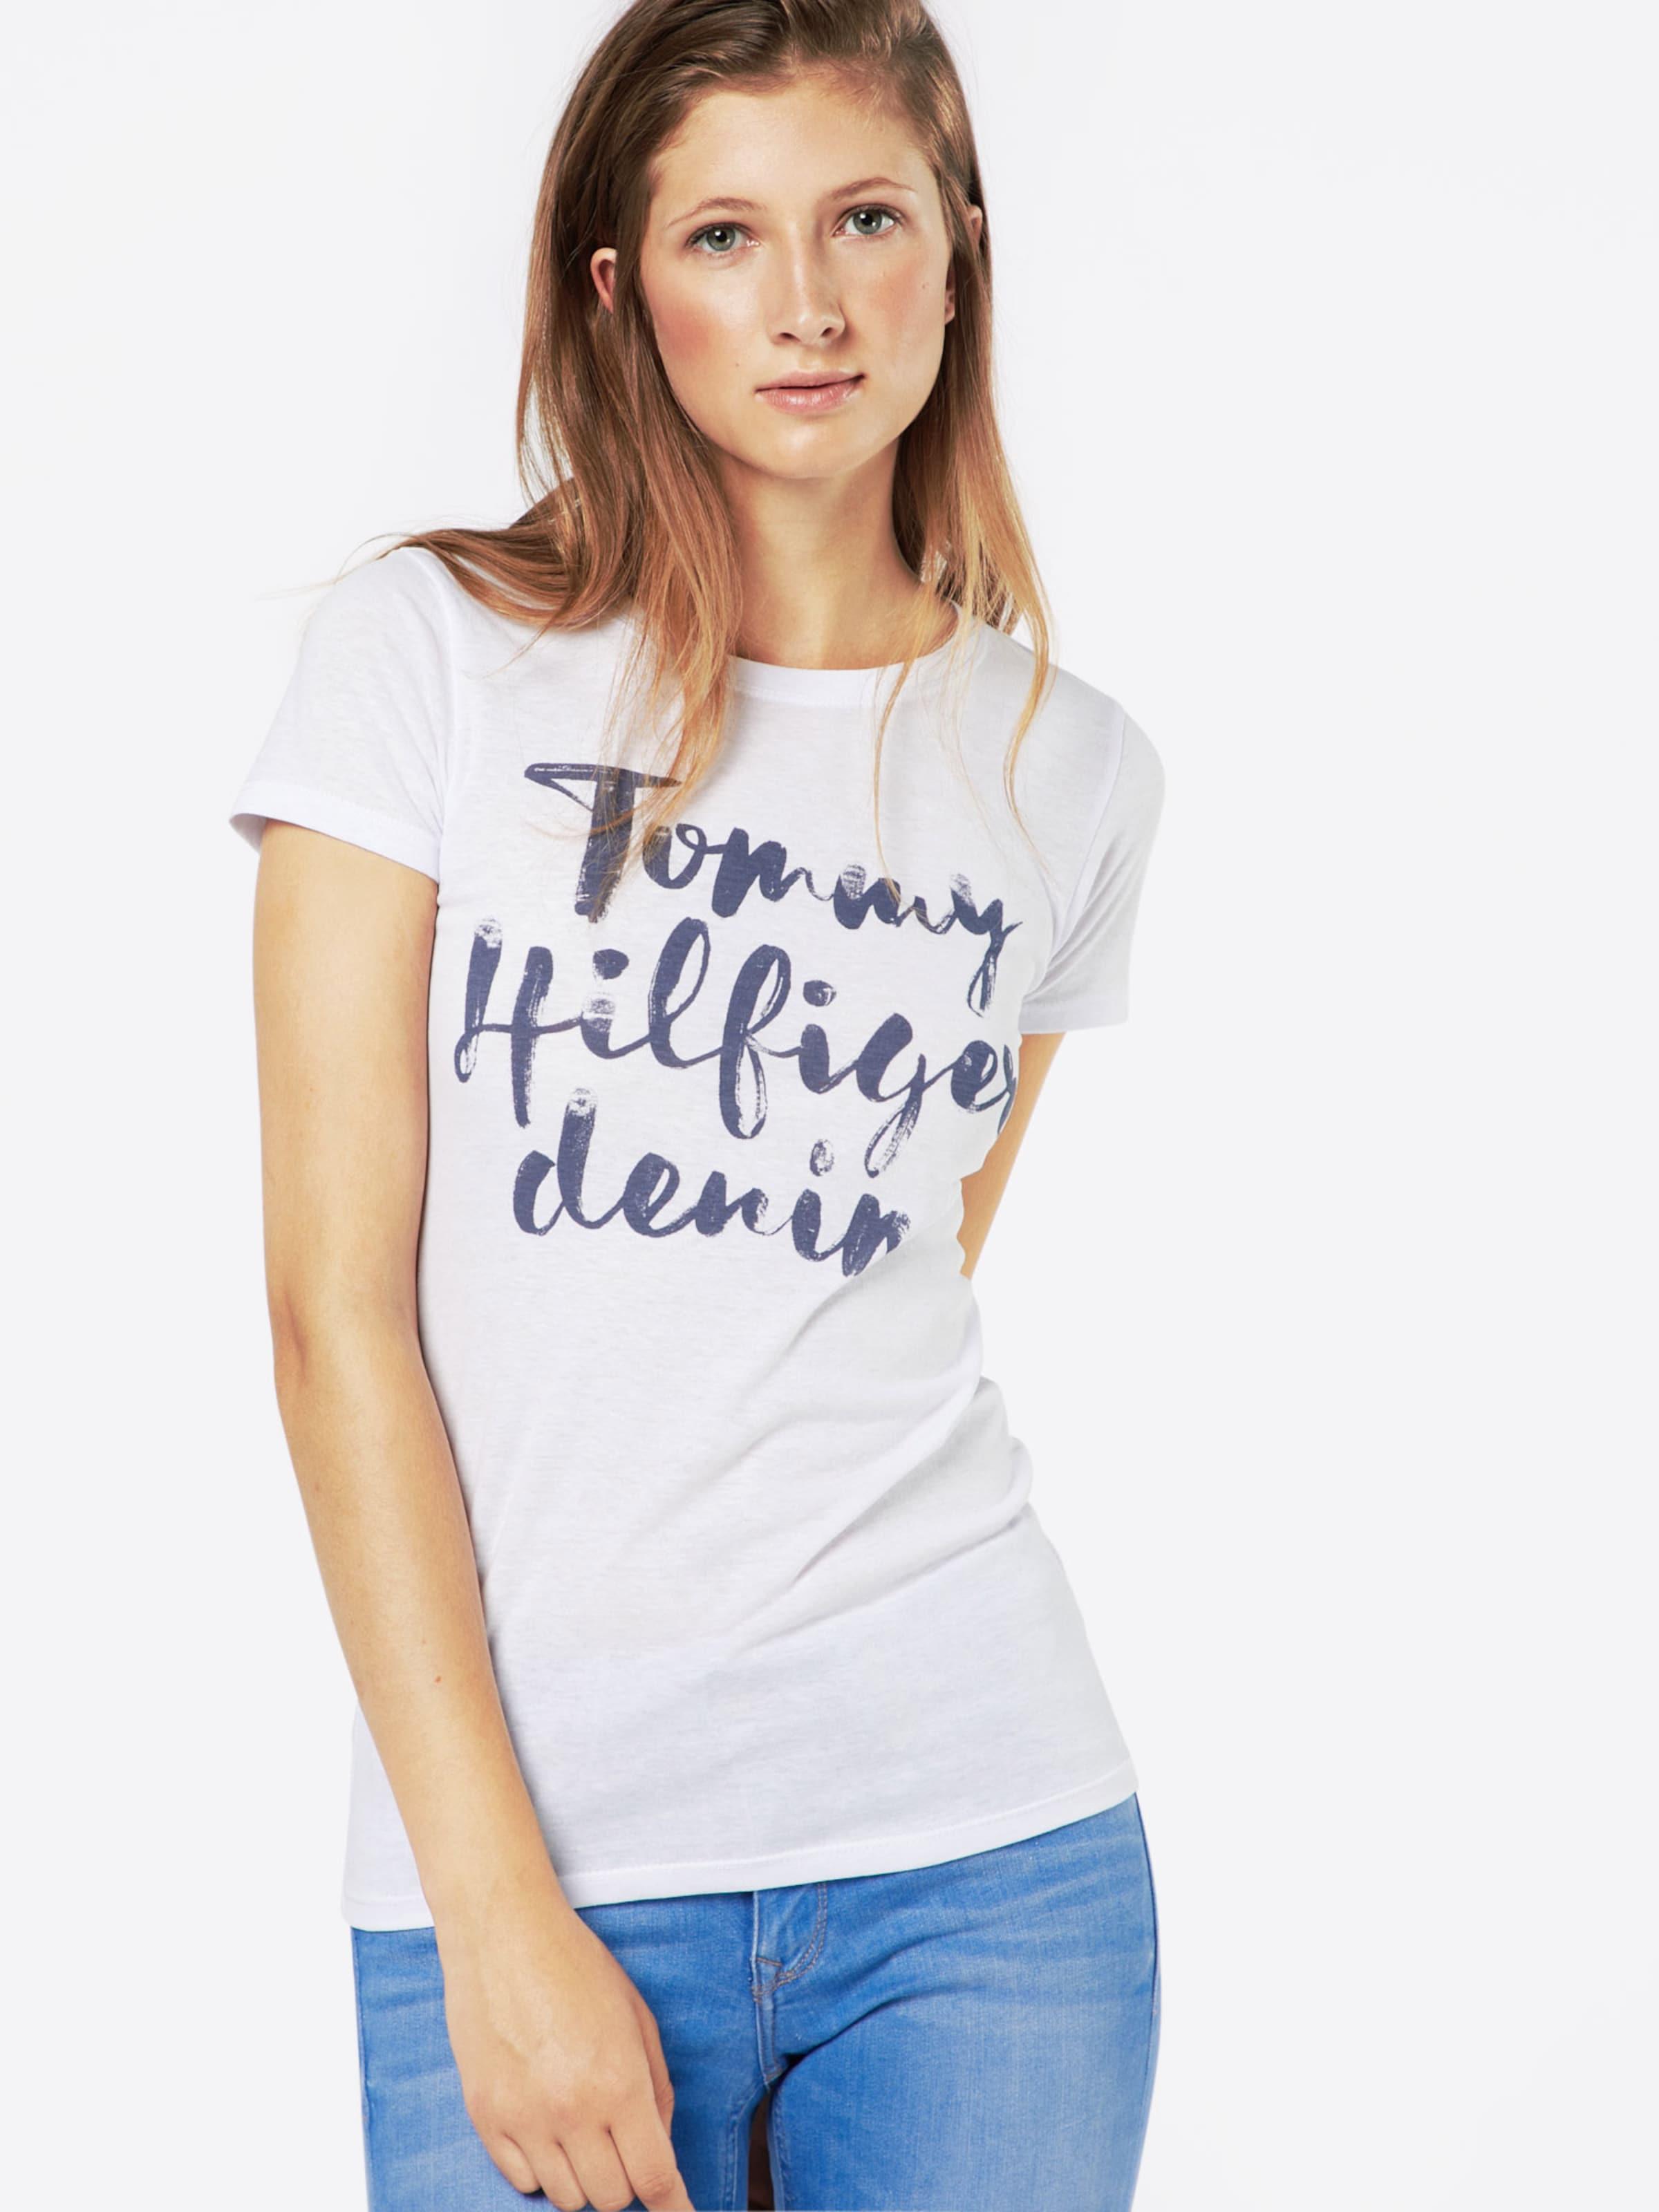 Tommy Jeans T-Shirt 'THDW' Billig Größte Lieferant Beeile Dich tnide3b